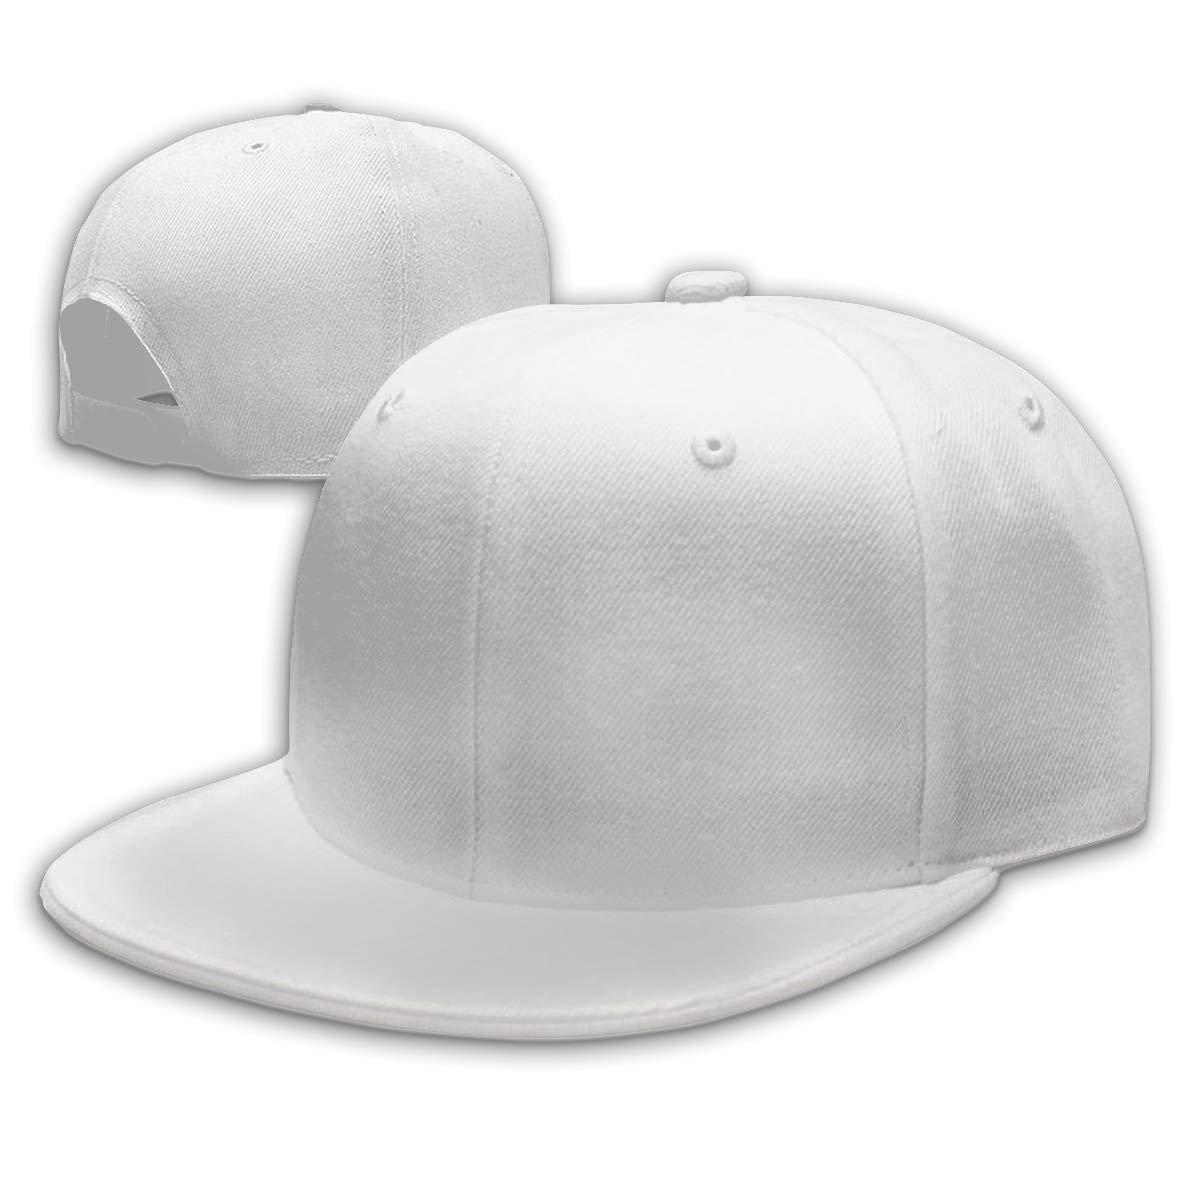 Novelcustom The Psycho Realm Snapback Hats Gorras de béisbol para ...